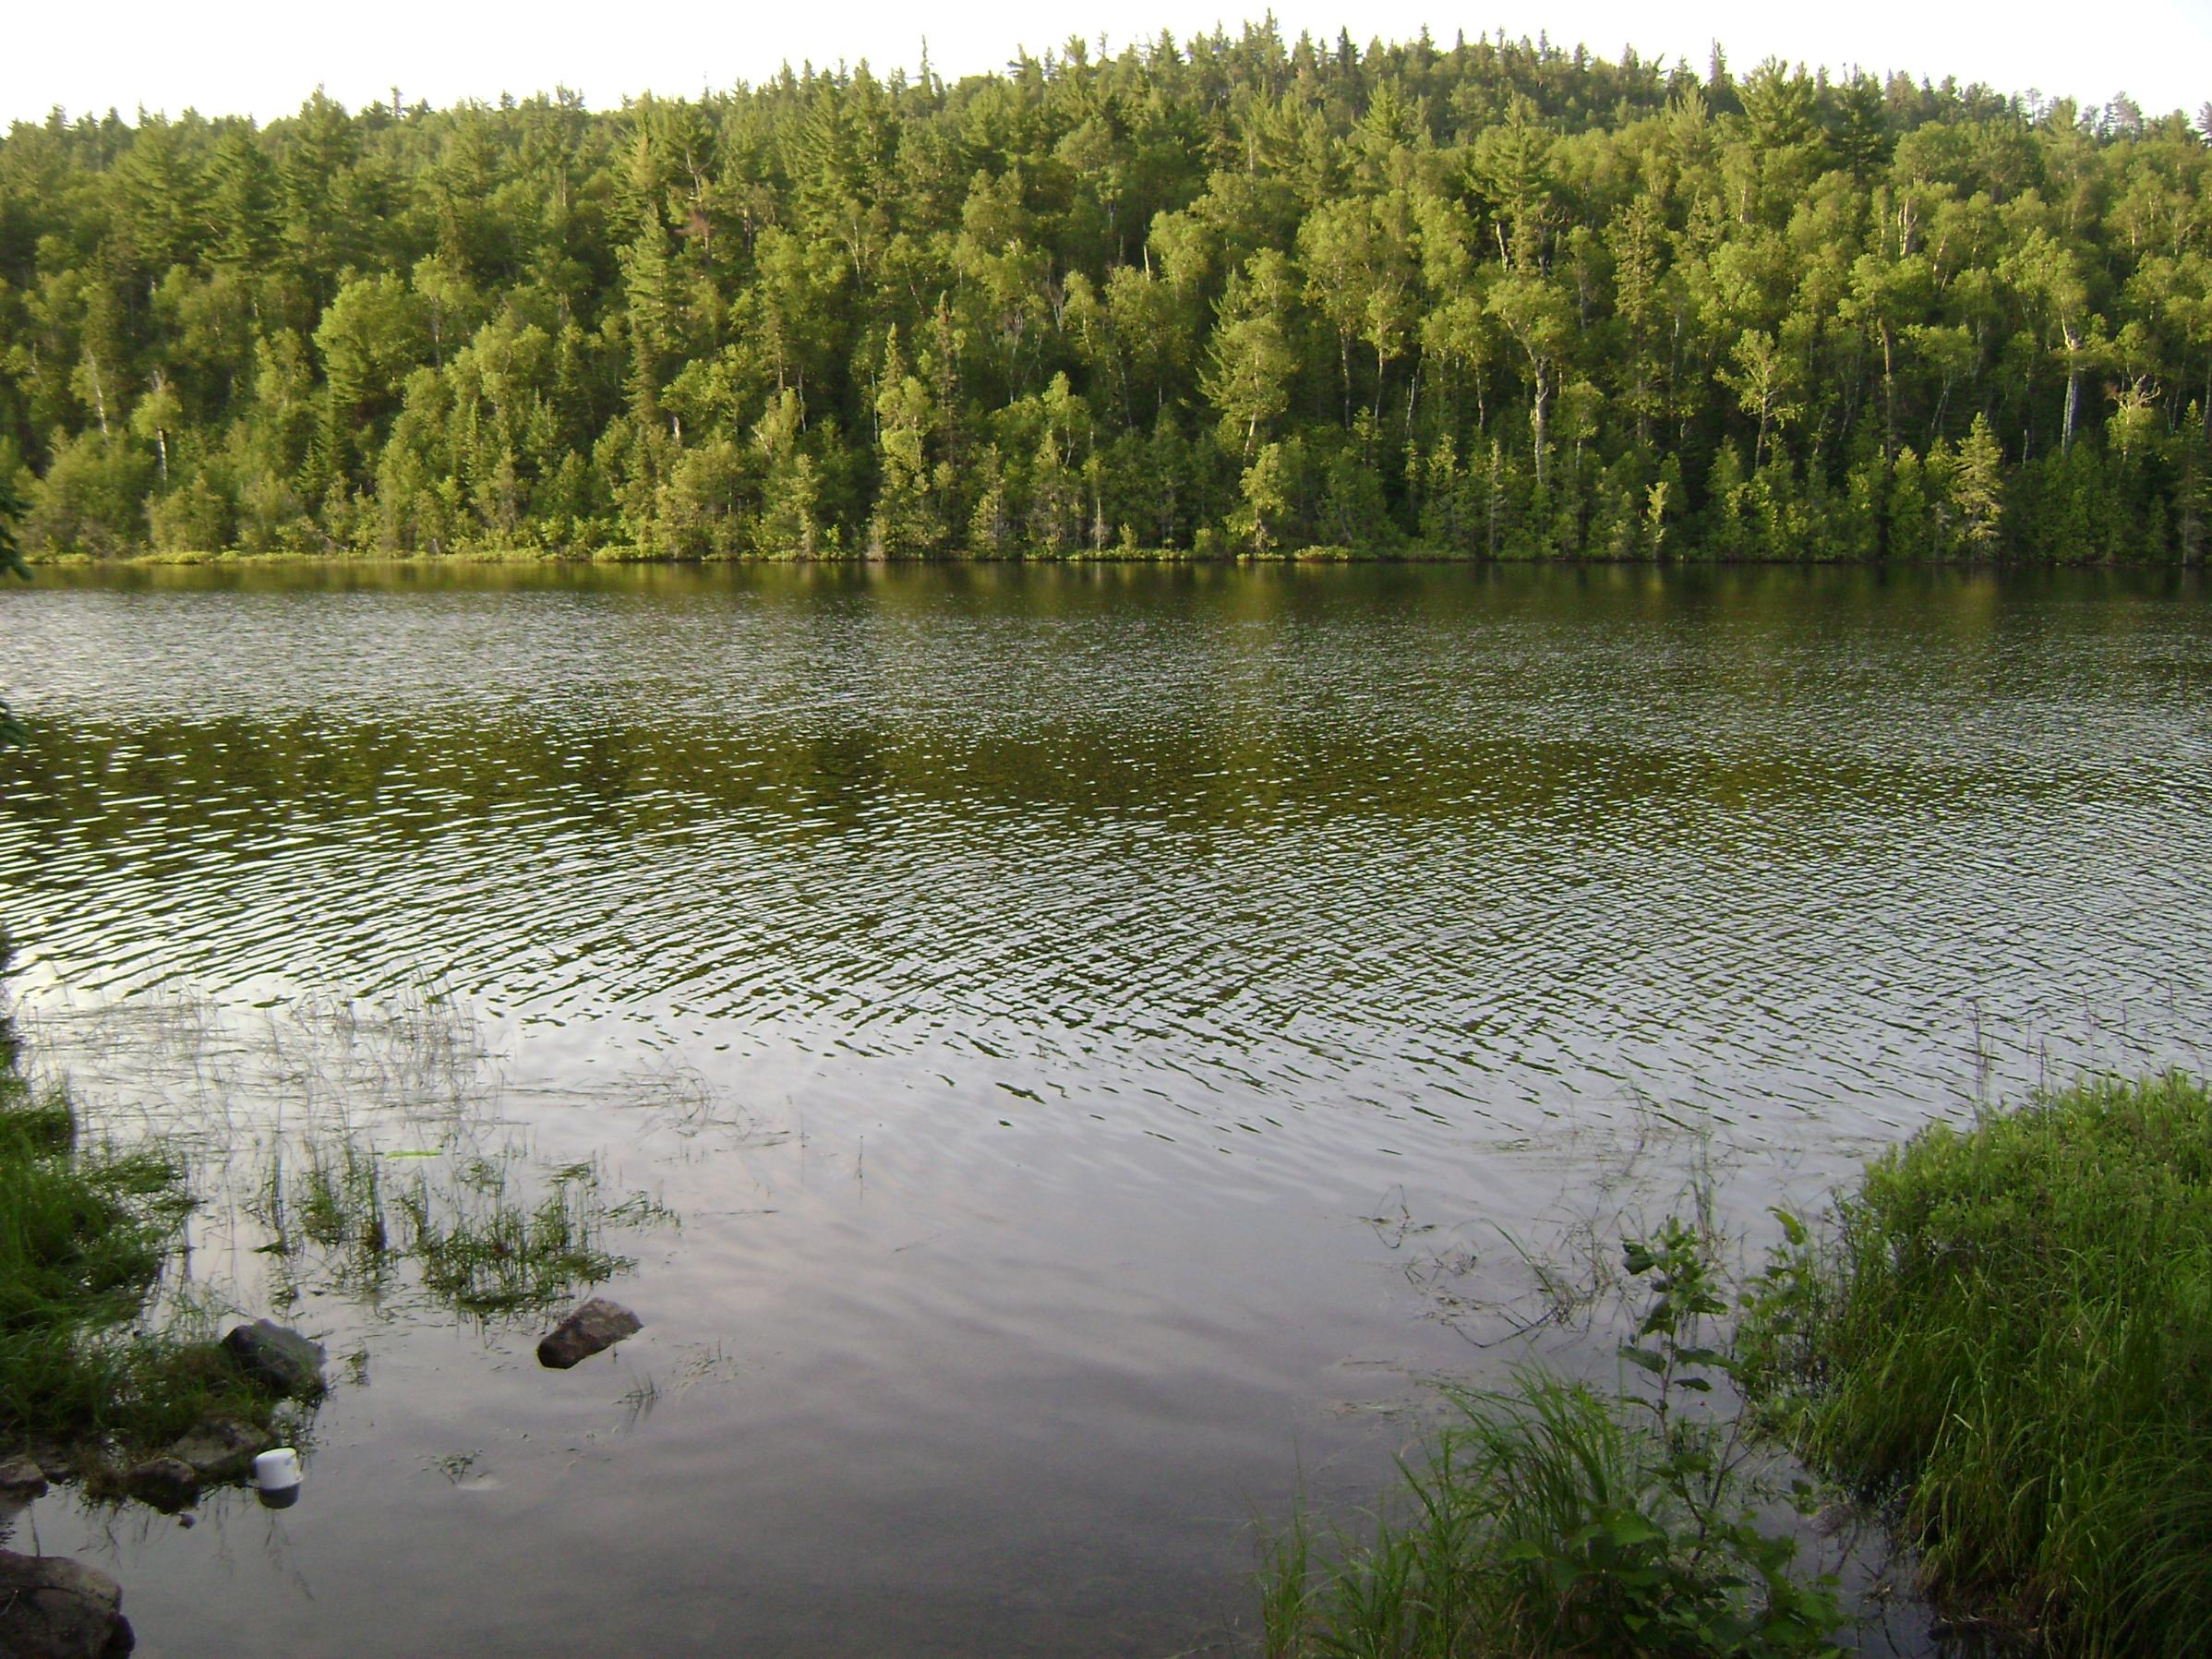 Island Site Canoe Landing